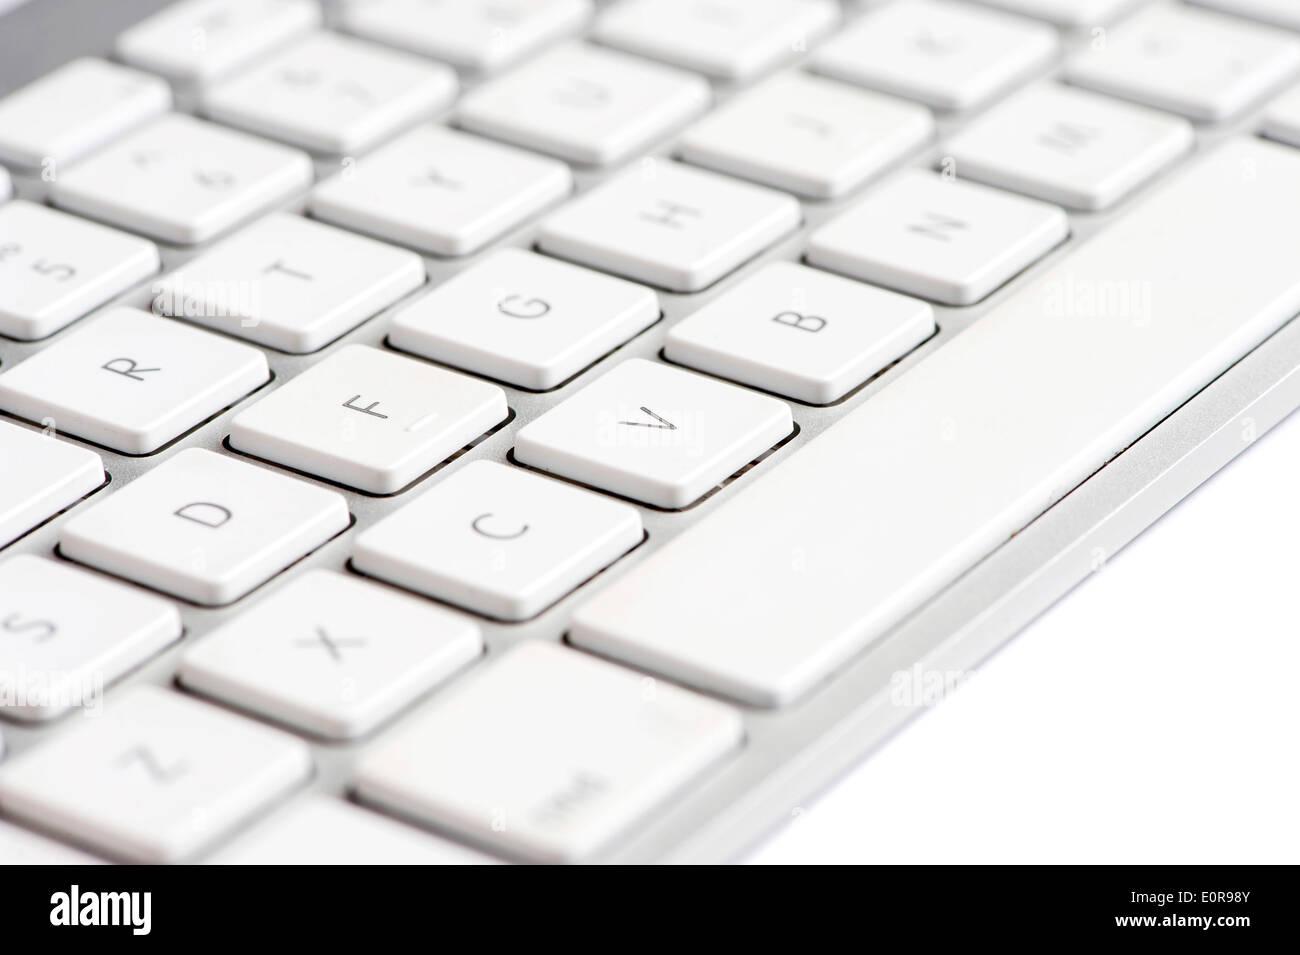 Apple mac white Keyboard focused on the letter V - Stock Image